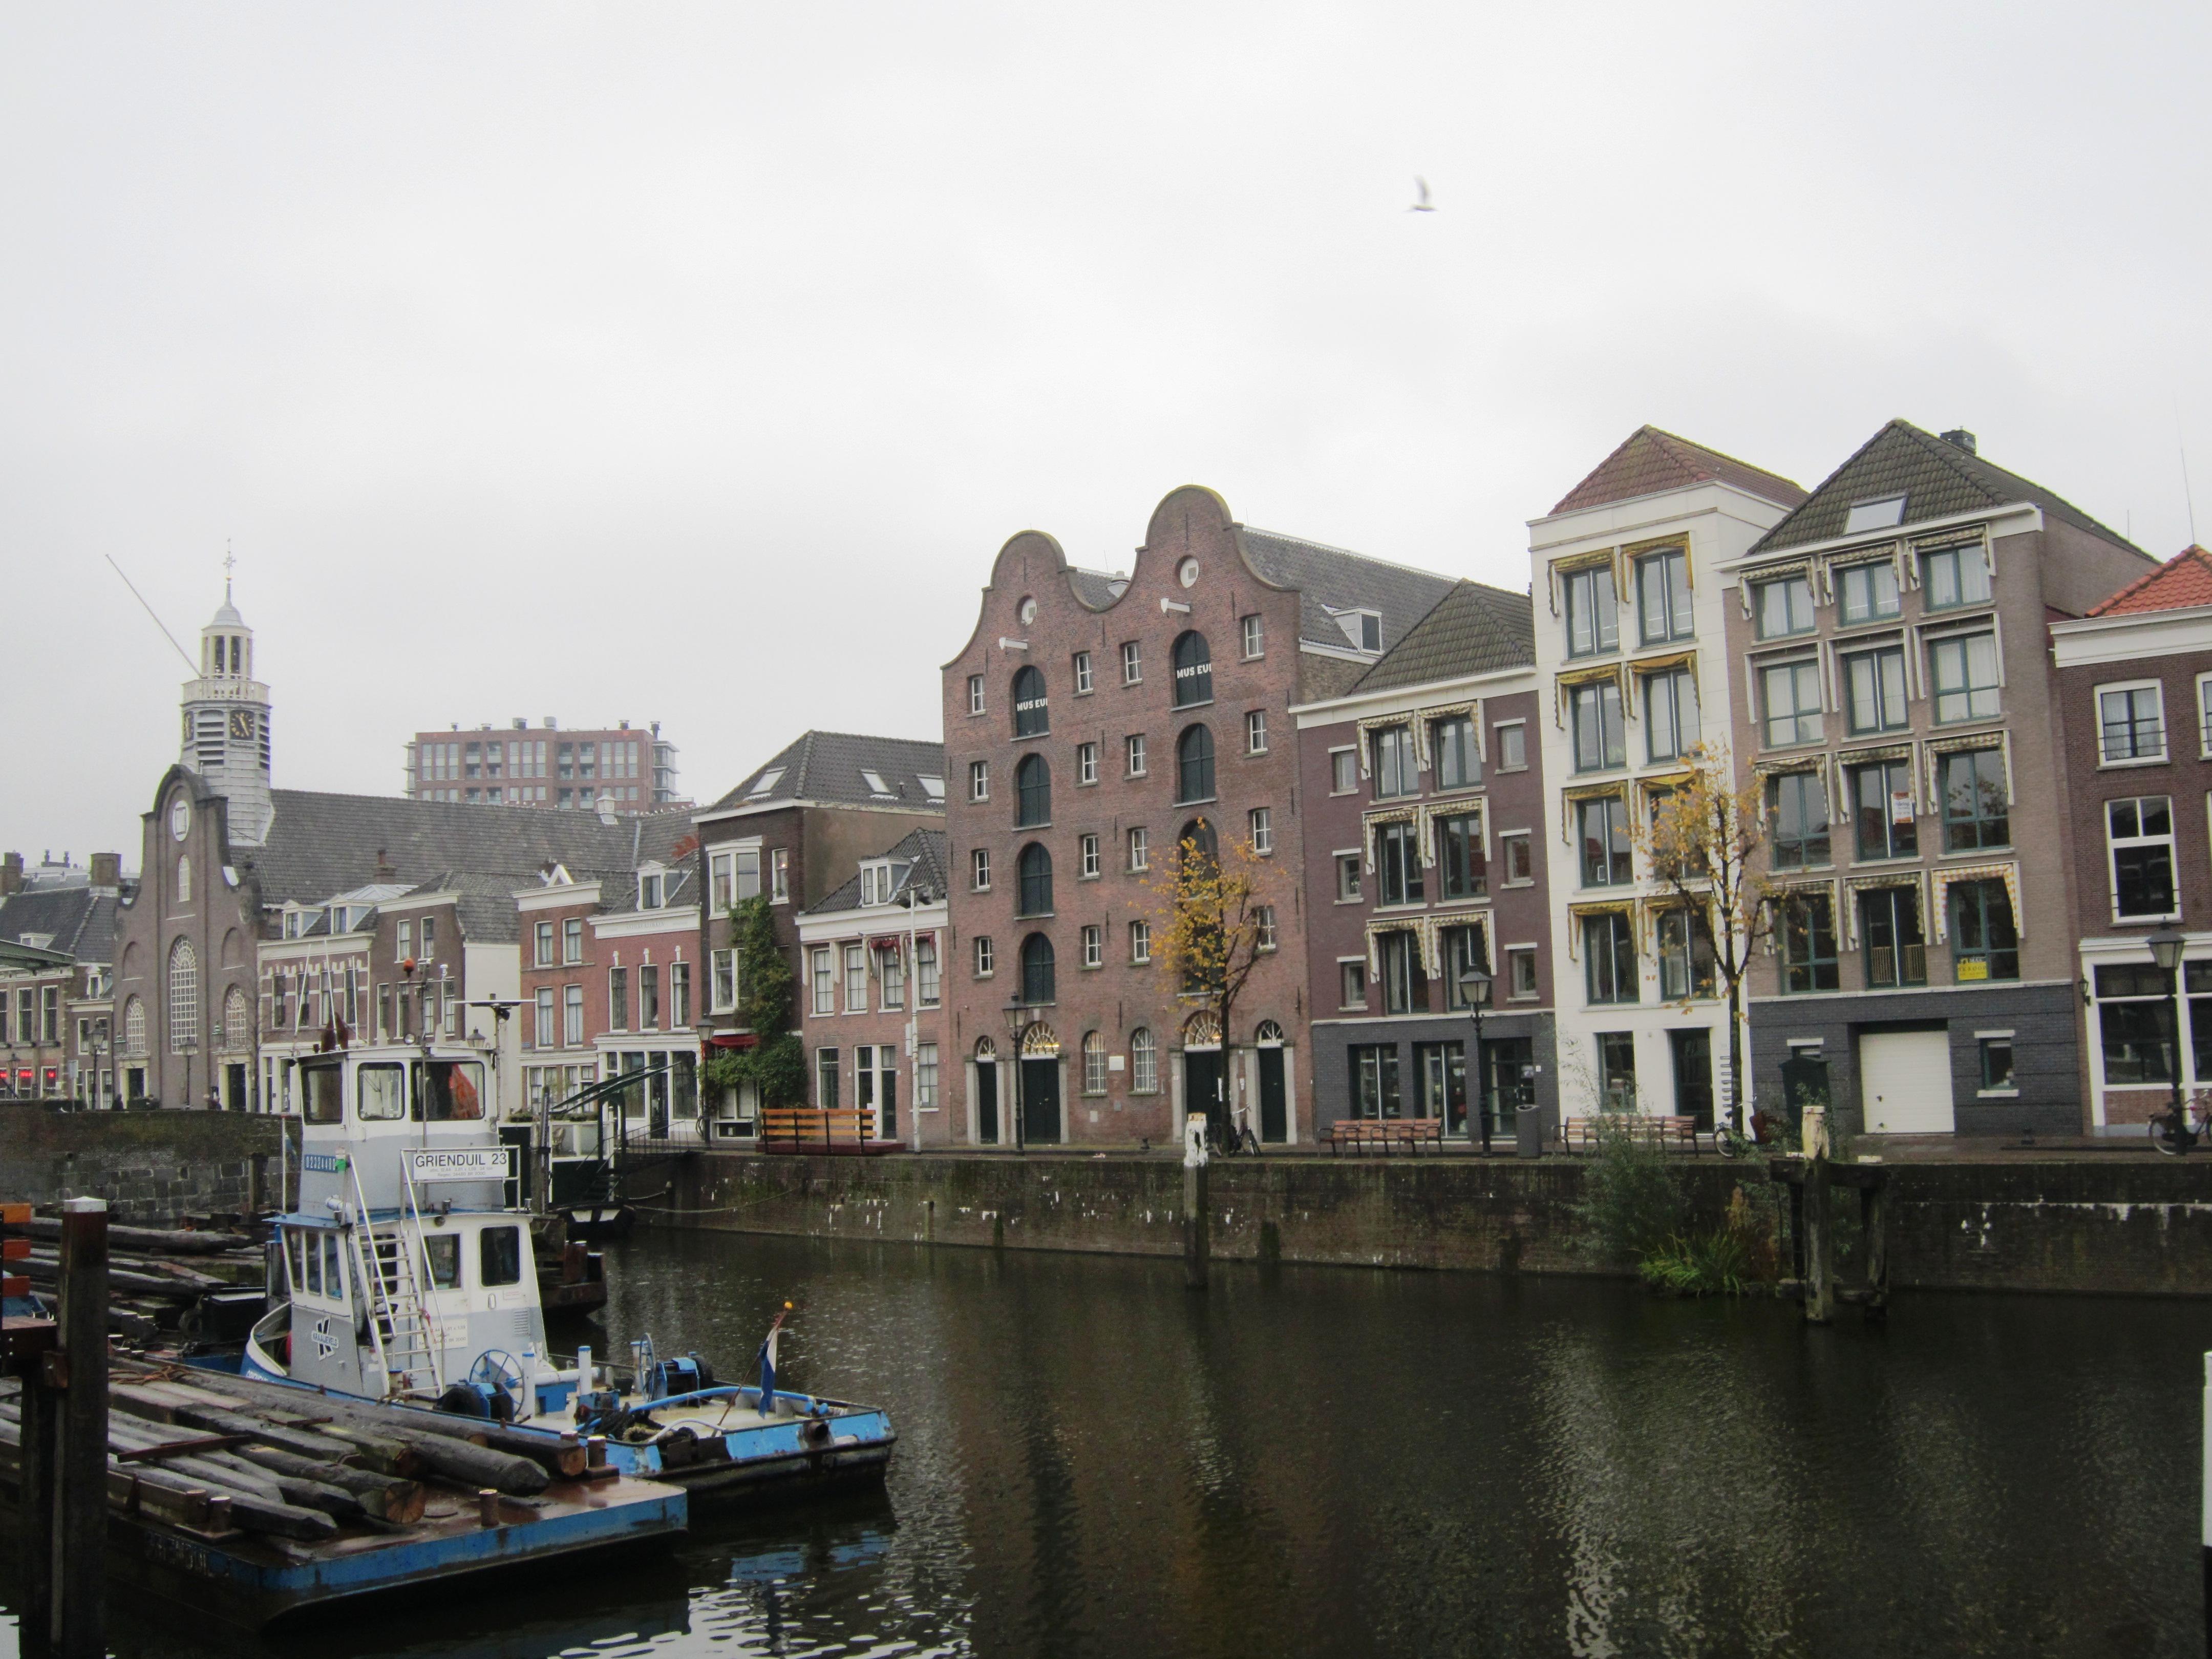 Rotterdam Netherlands  City pictures : Description Delfshaven Rotterdam the Netherlands 09